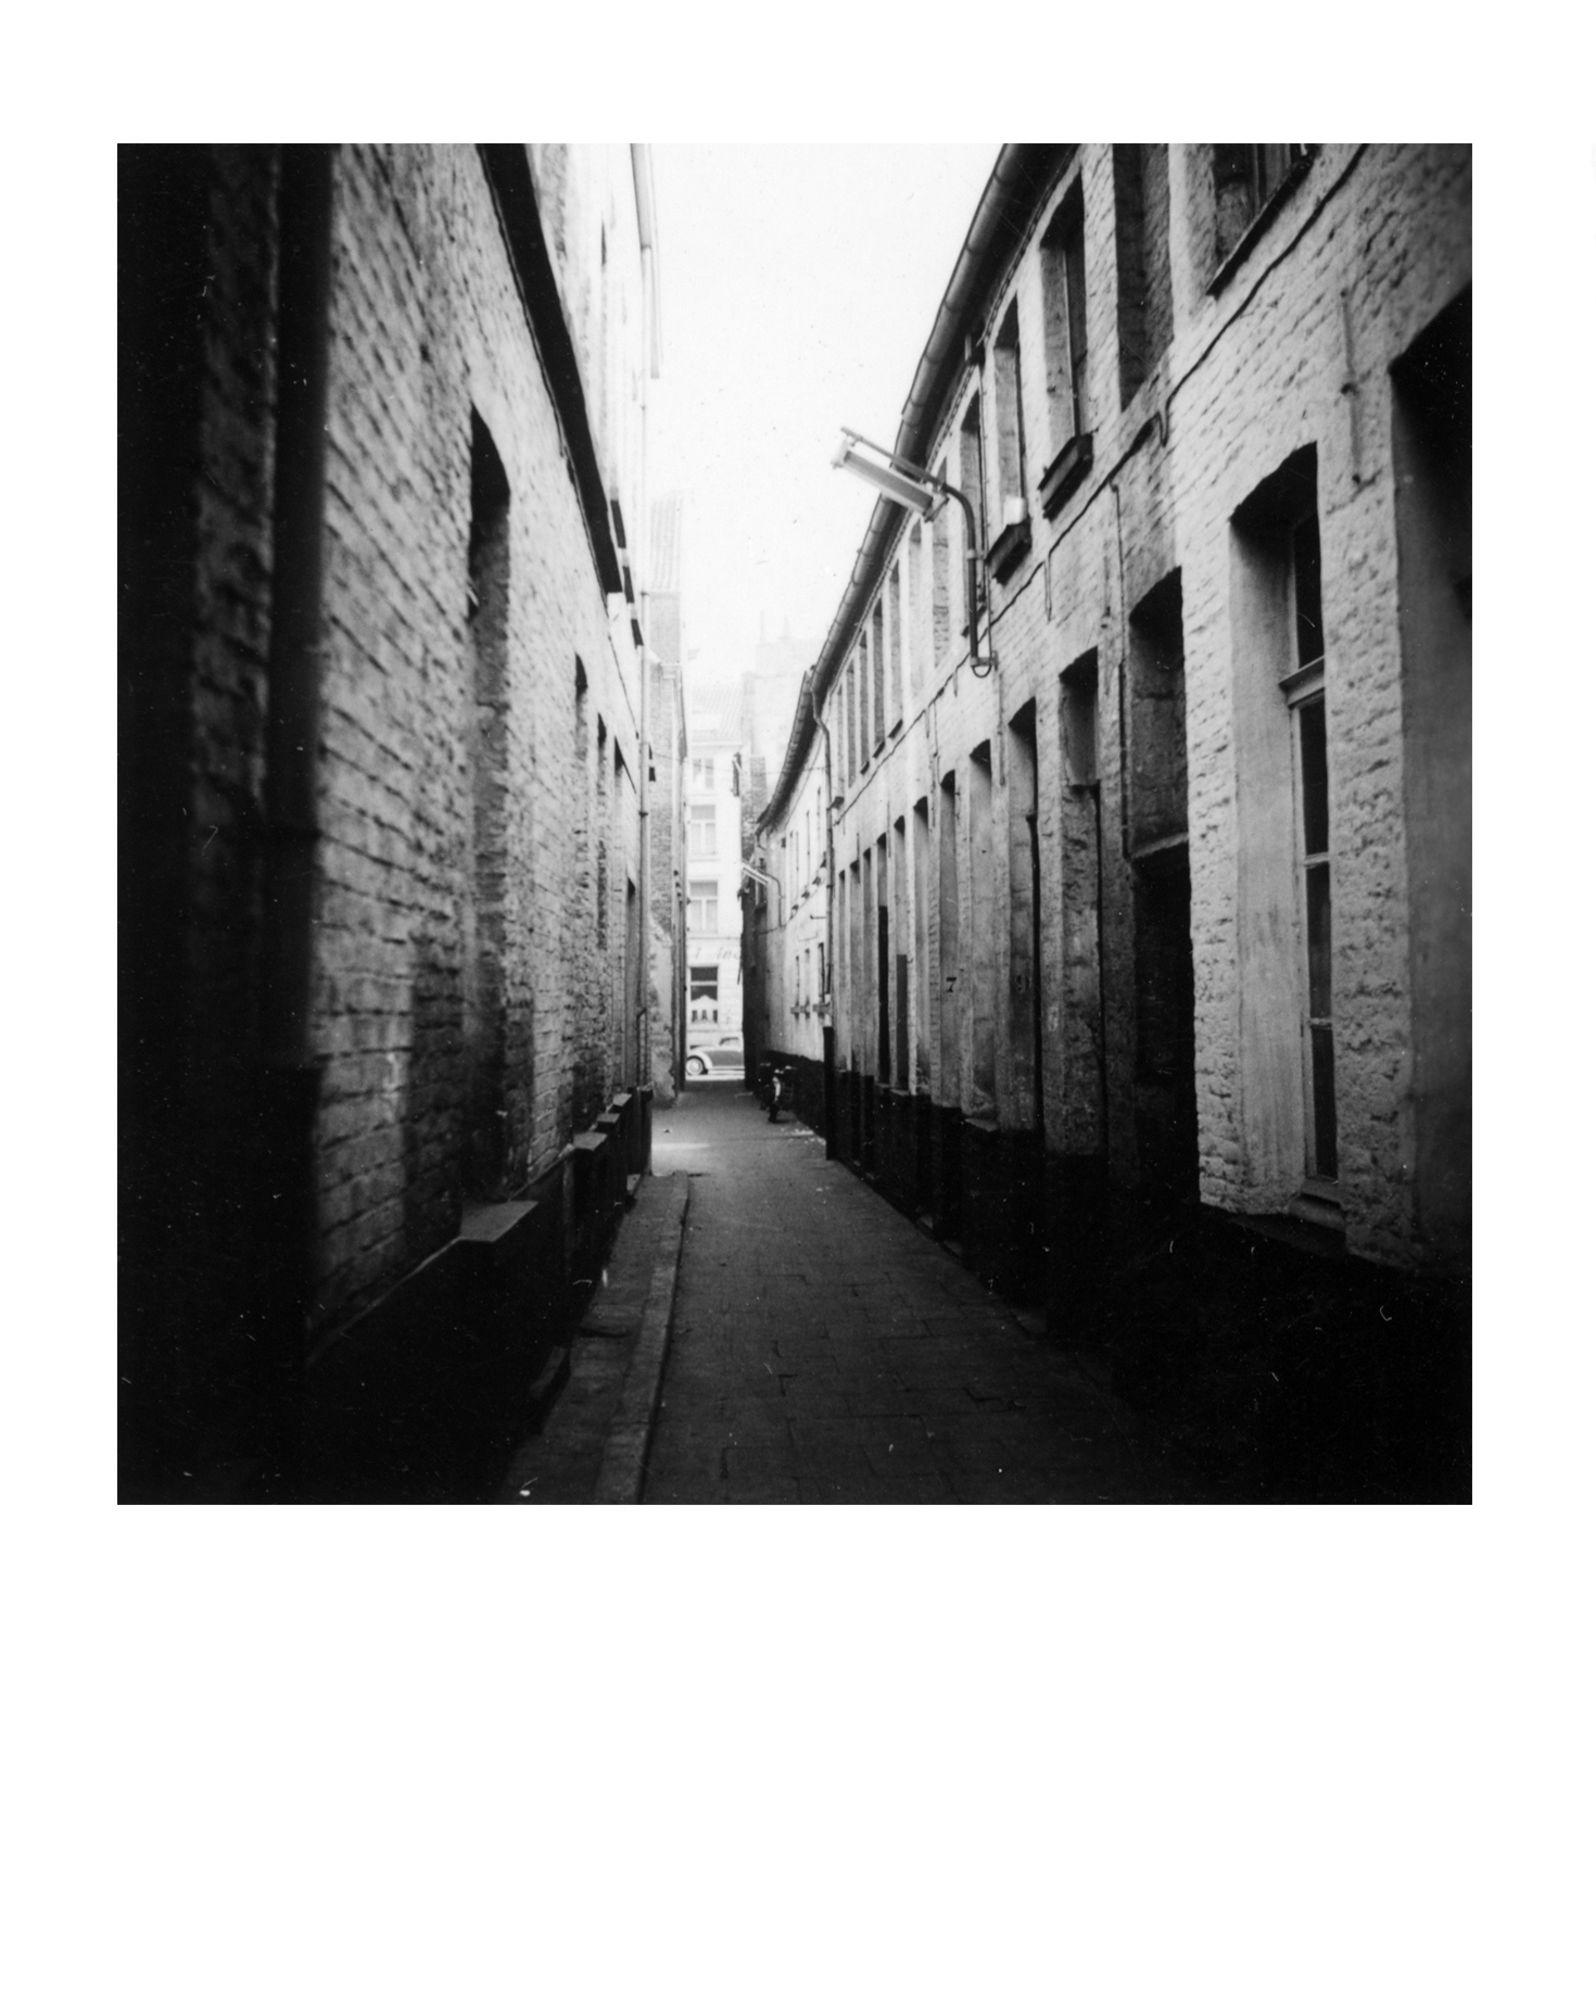 Heilig-Sacramentstraat01_19590220.jpg